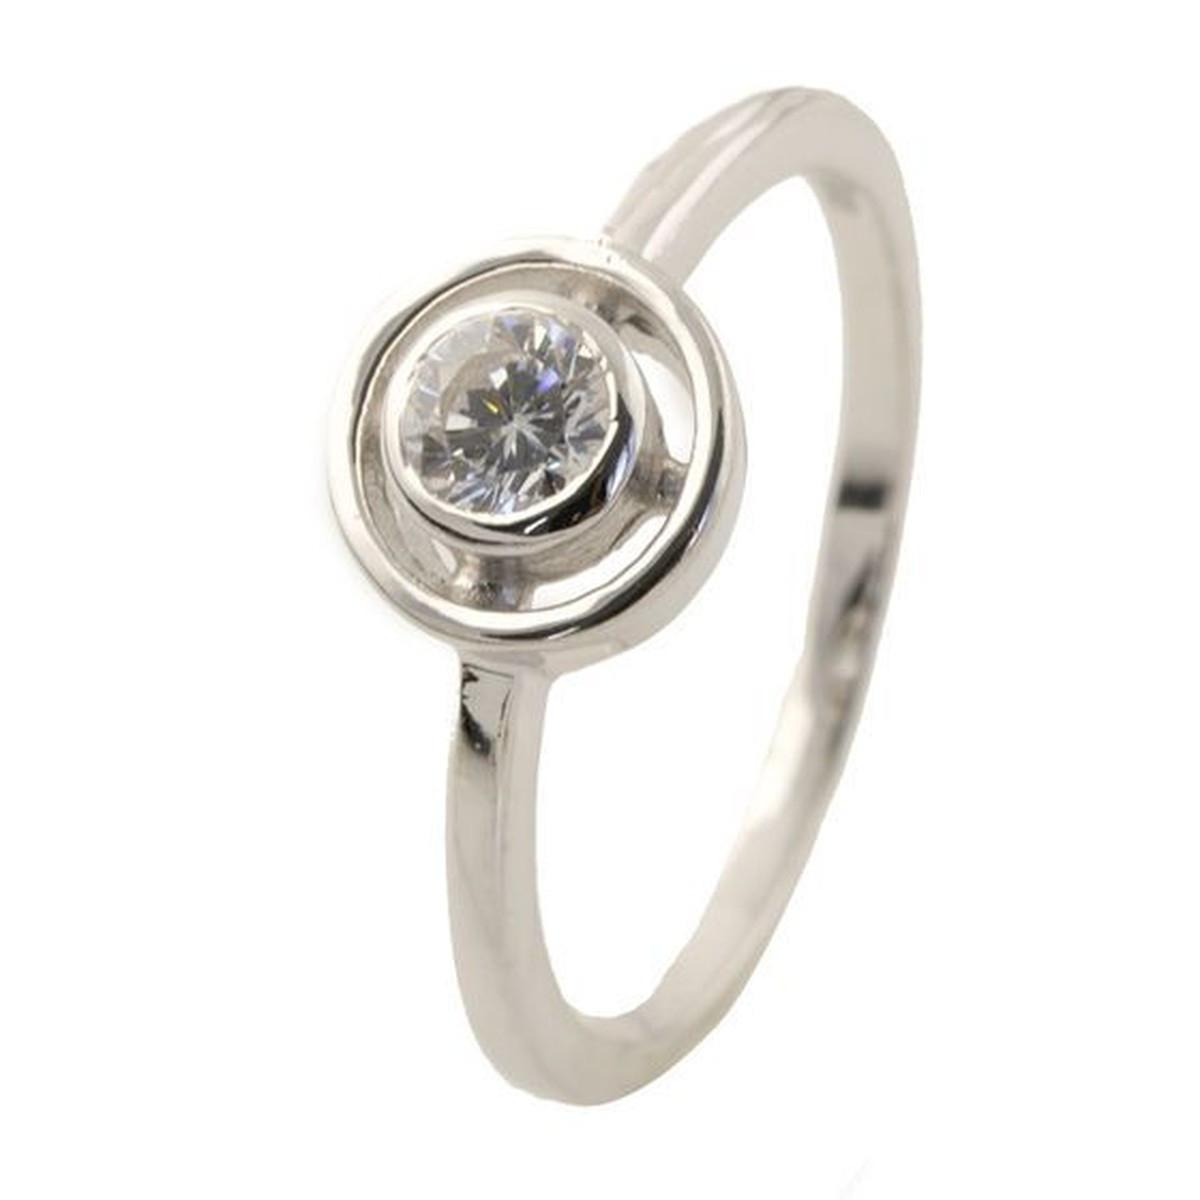 Серебряное кольцо DreamJewelry с фианитами (1145418) 16 размер